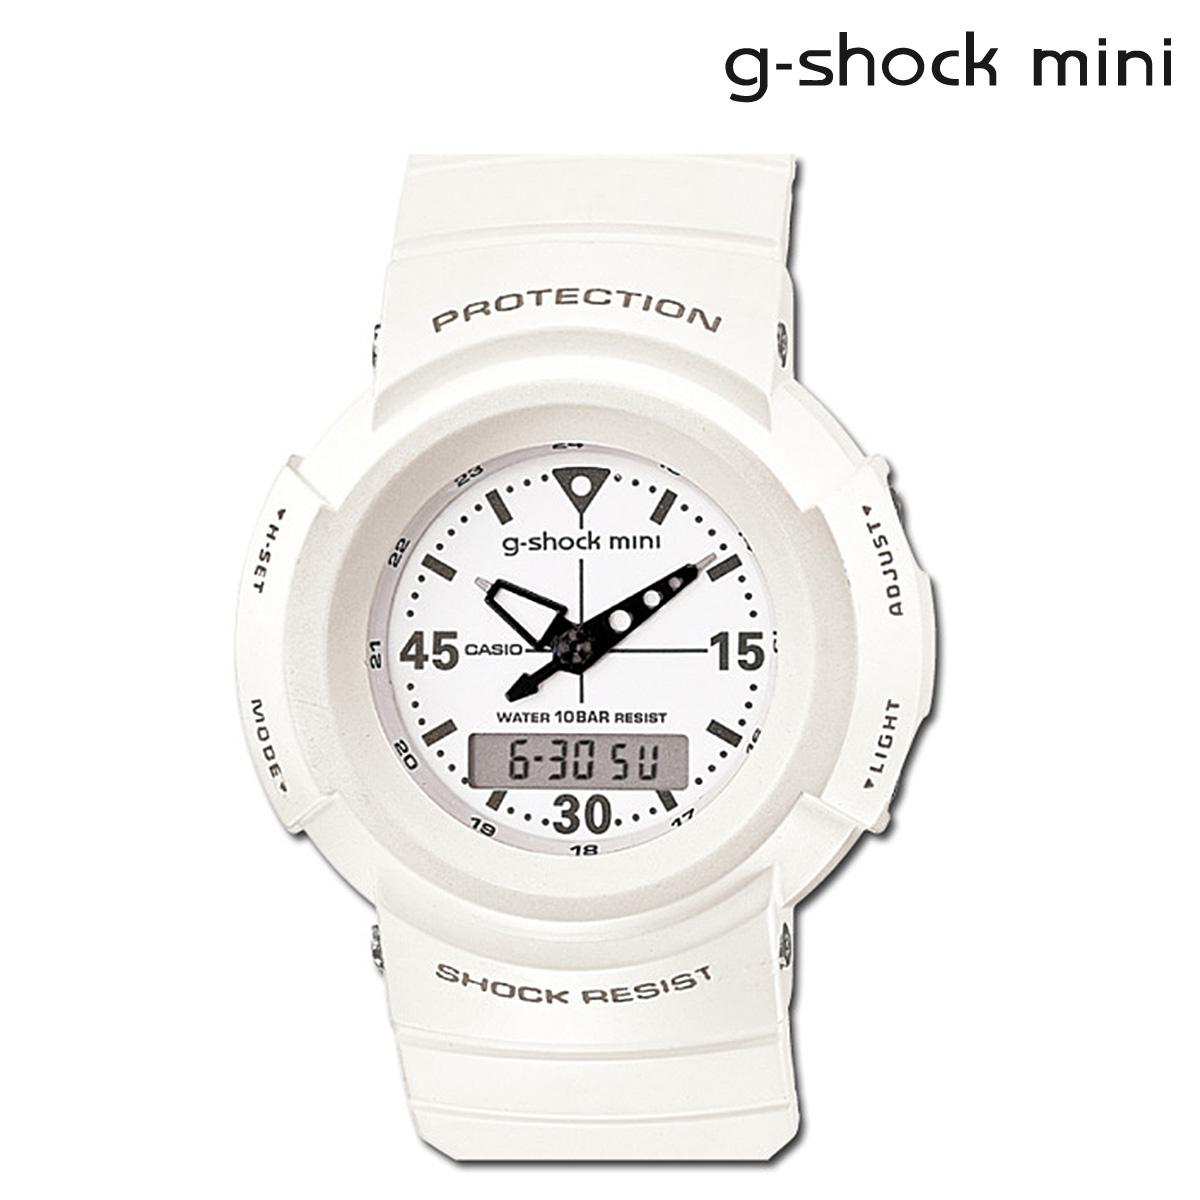 Casio CASIO g-shock mini ladies watch men's GMN-500-7BJR white [11 / 10 new in stock] [regular] ★ ★